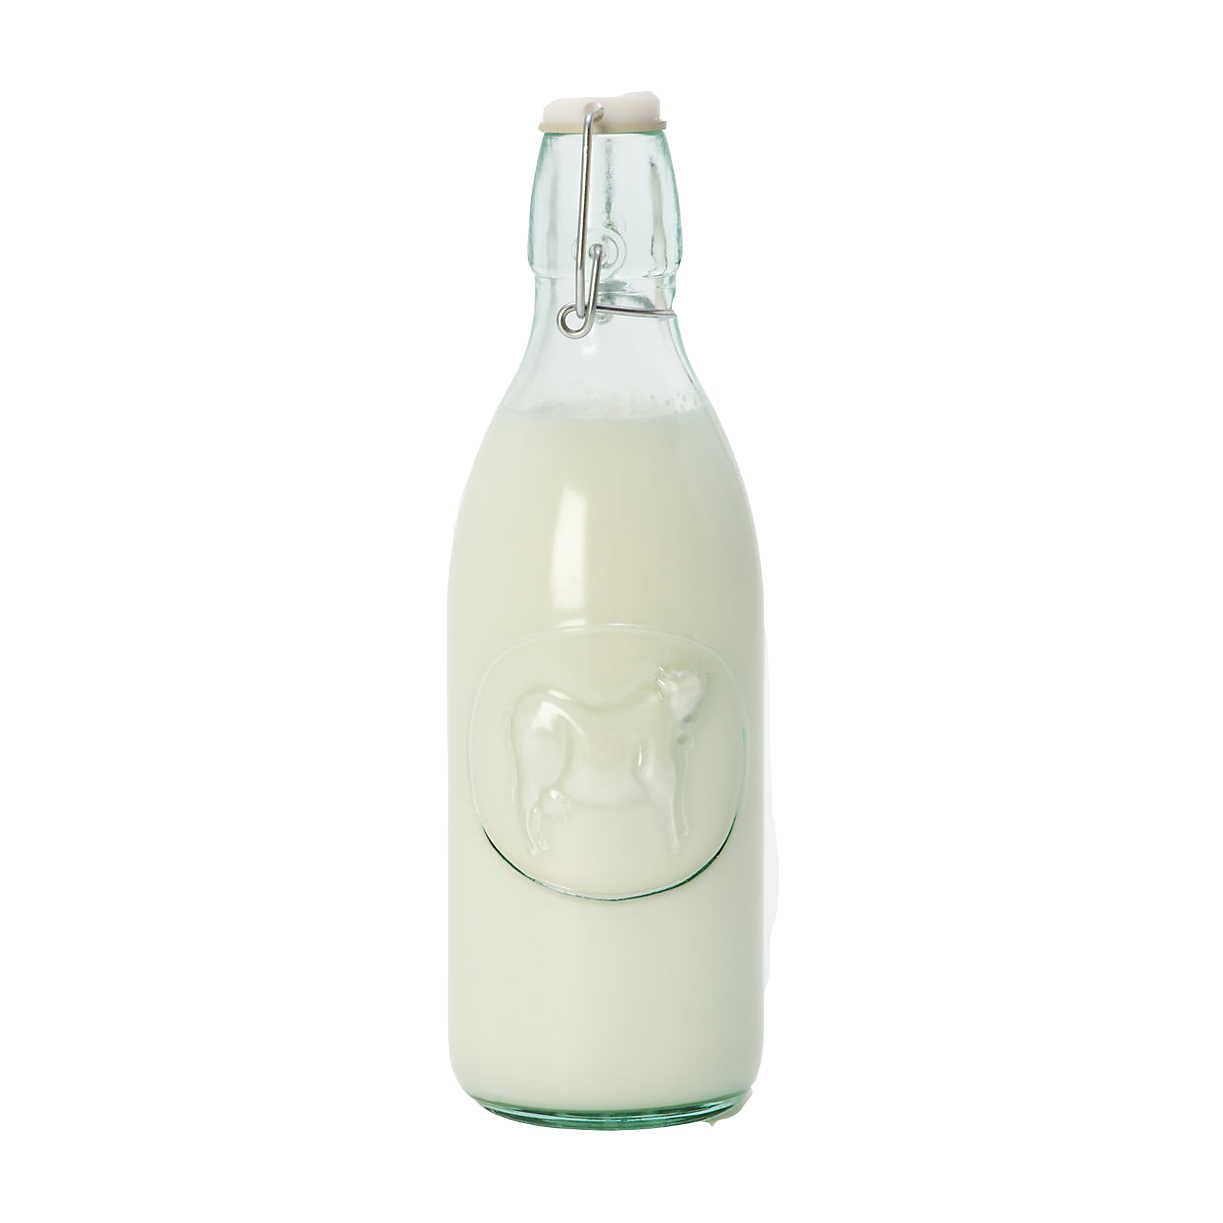 Бутылка с молоком картинка, своими